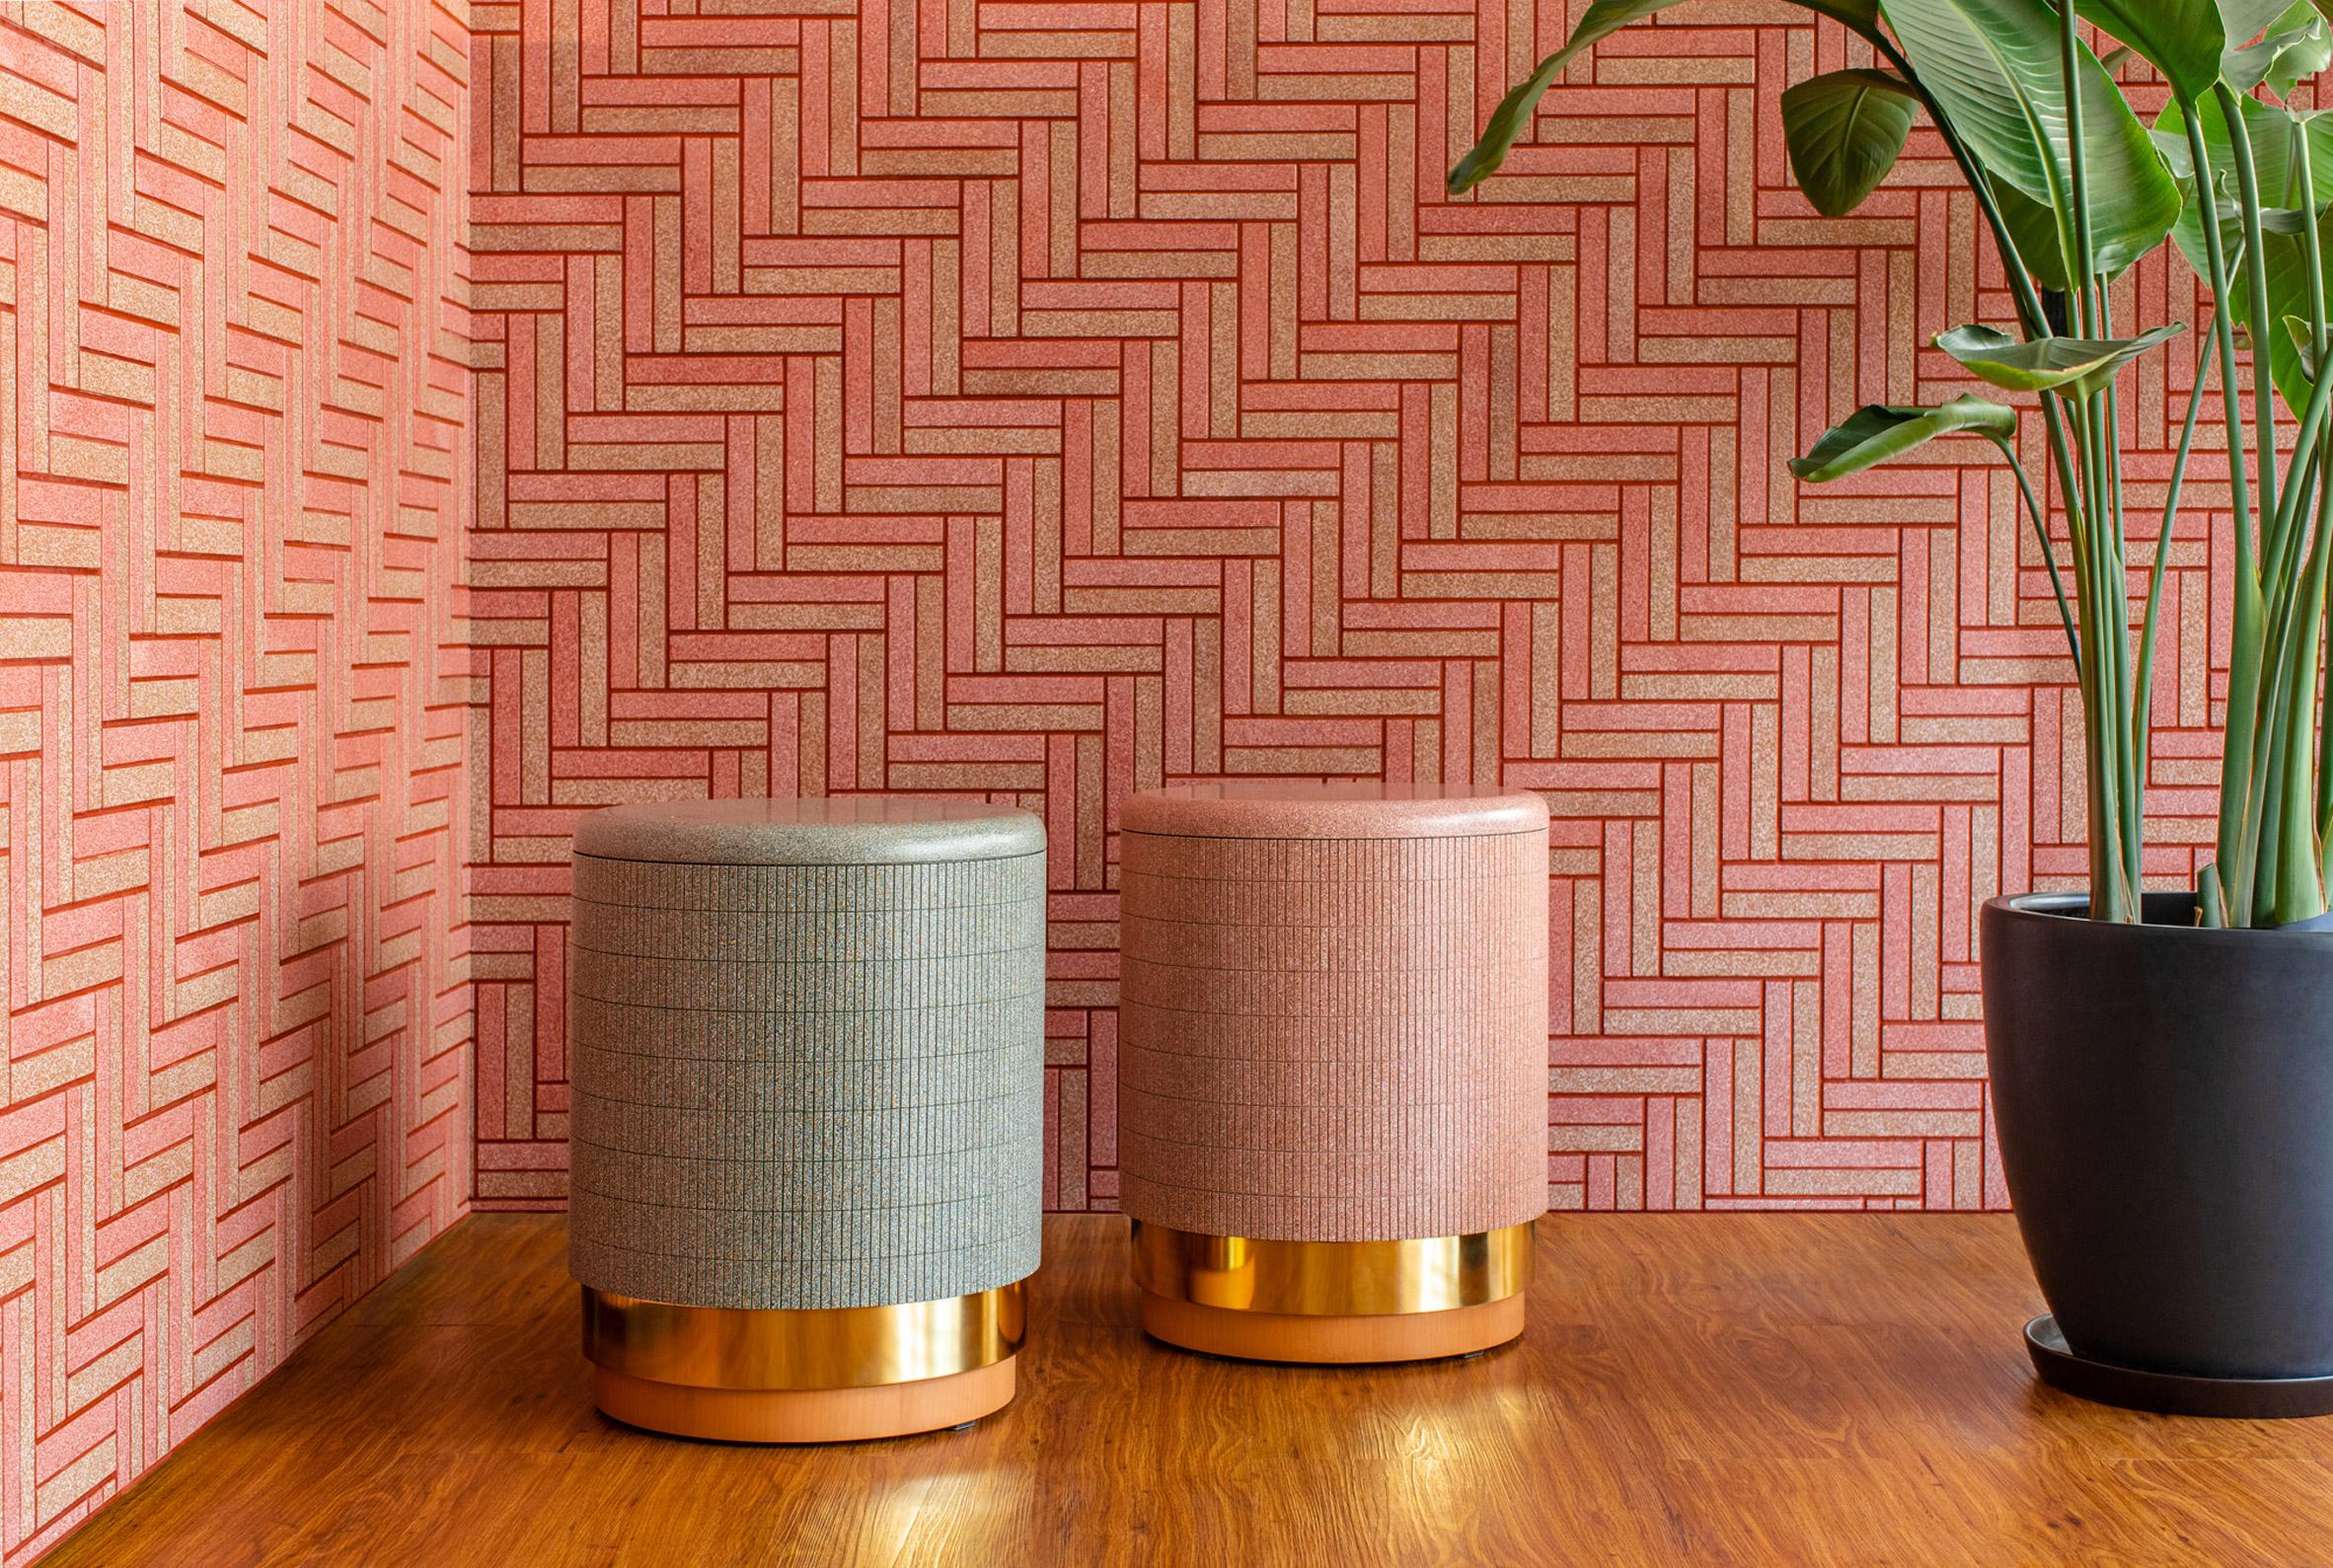 CArrelé tiles in pink